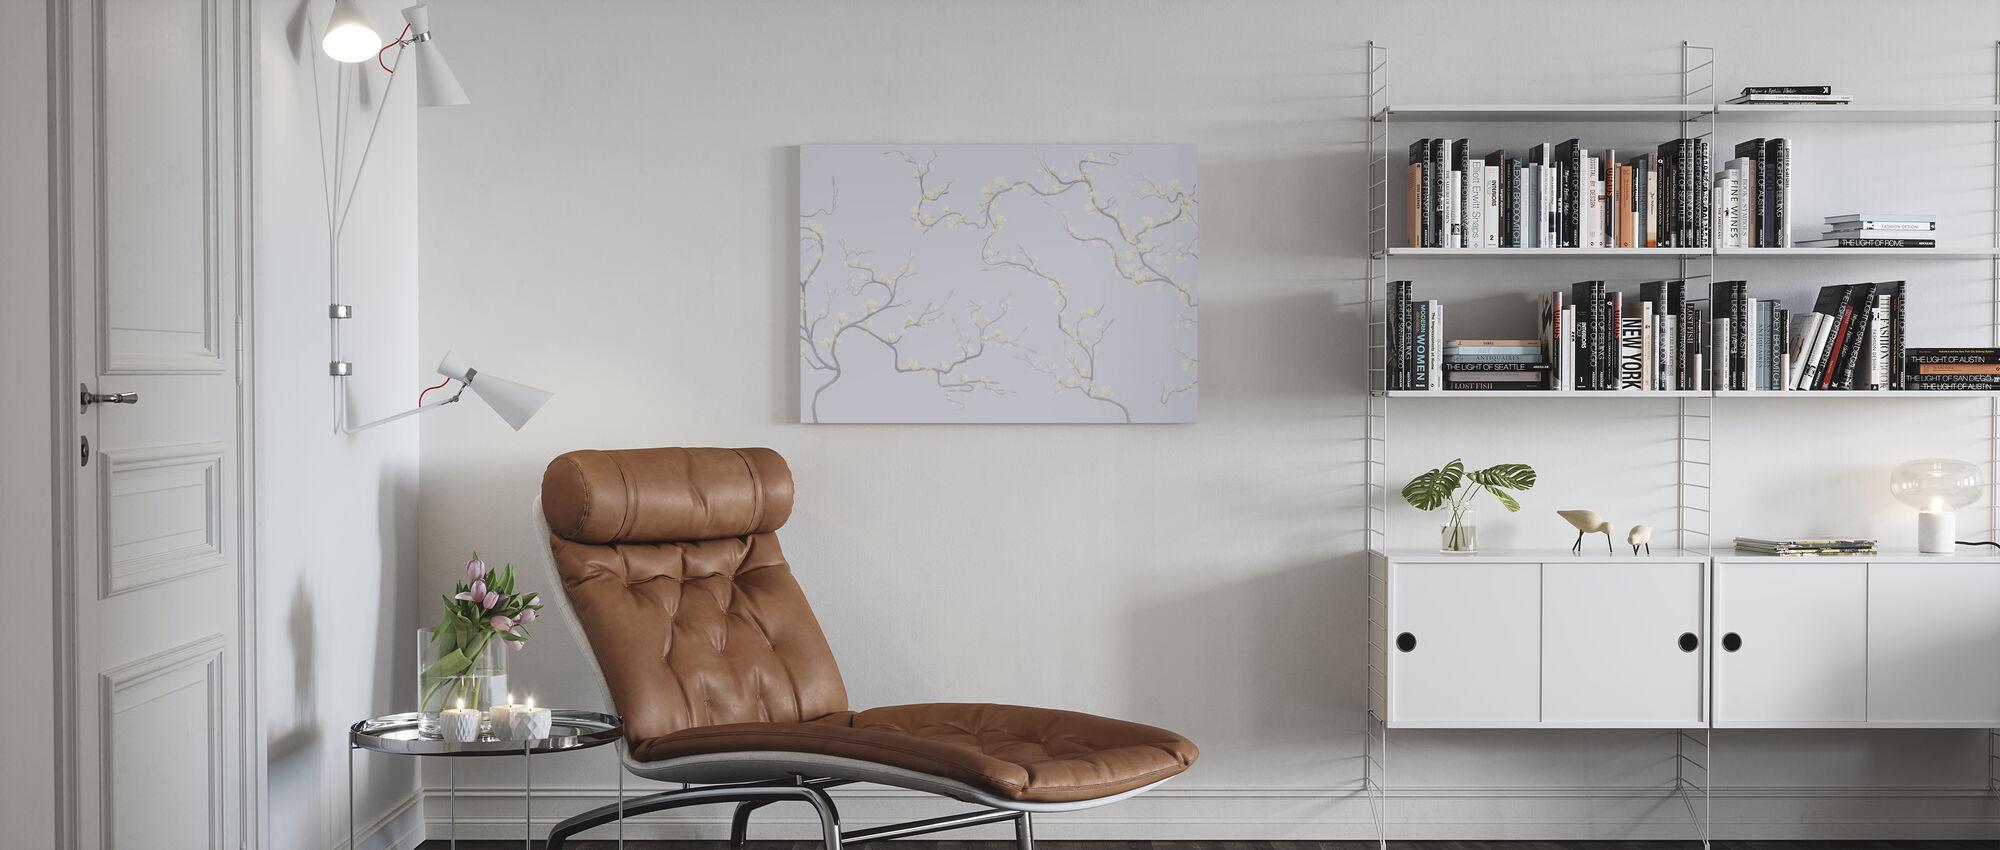 Flourishing Magnolia - Pale Violet - Canvas print - Living Room